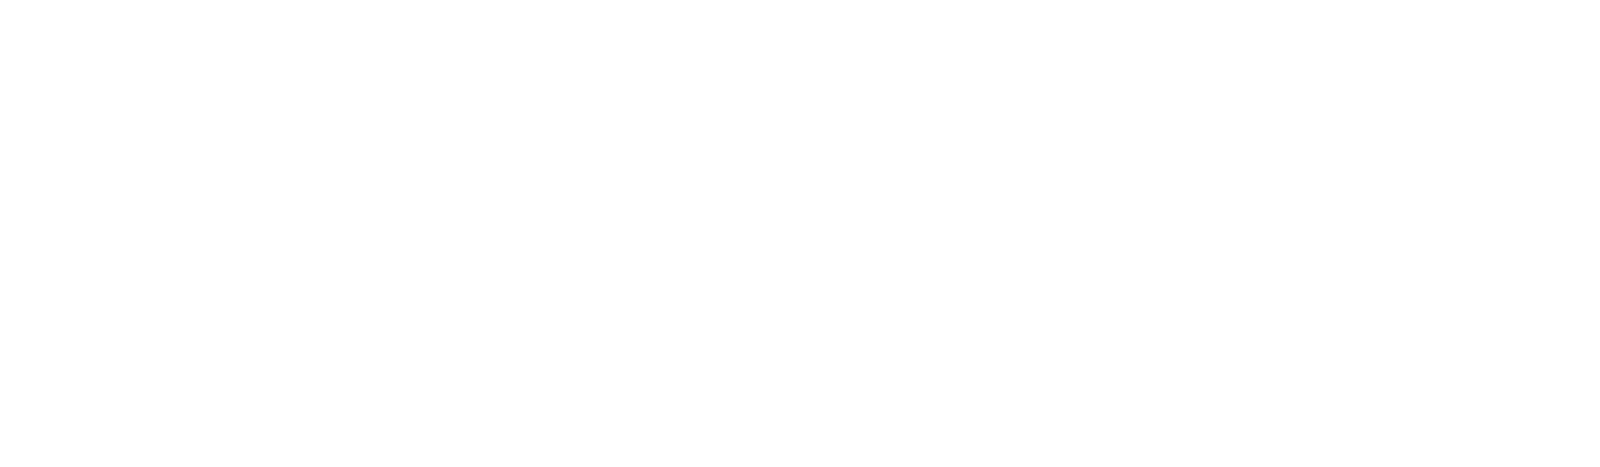 Logo Edition IM 12 71 Grad